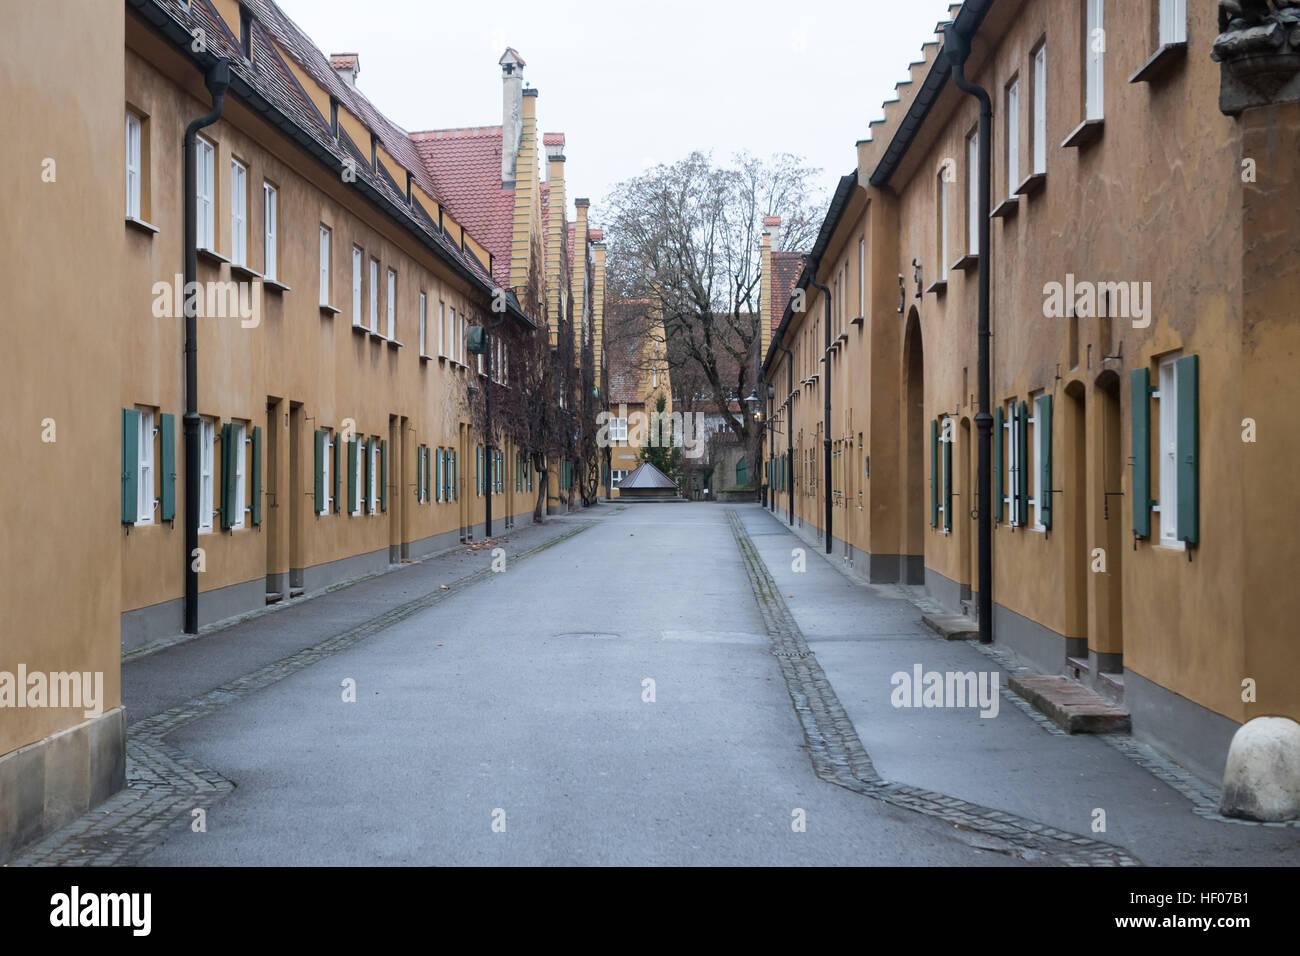 Len Augsburg fuggerei augsburg photos fuggerei augsburg images alamy